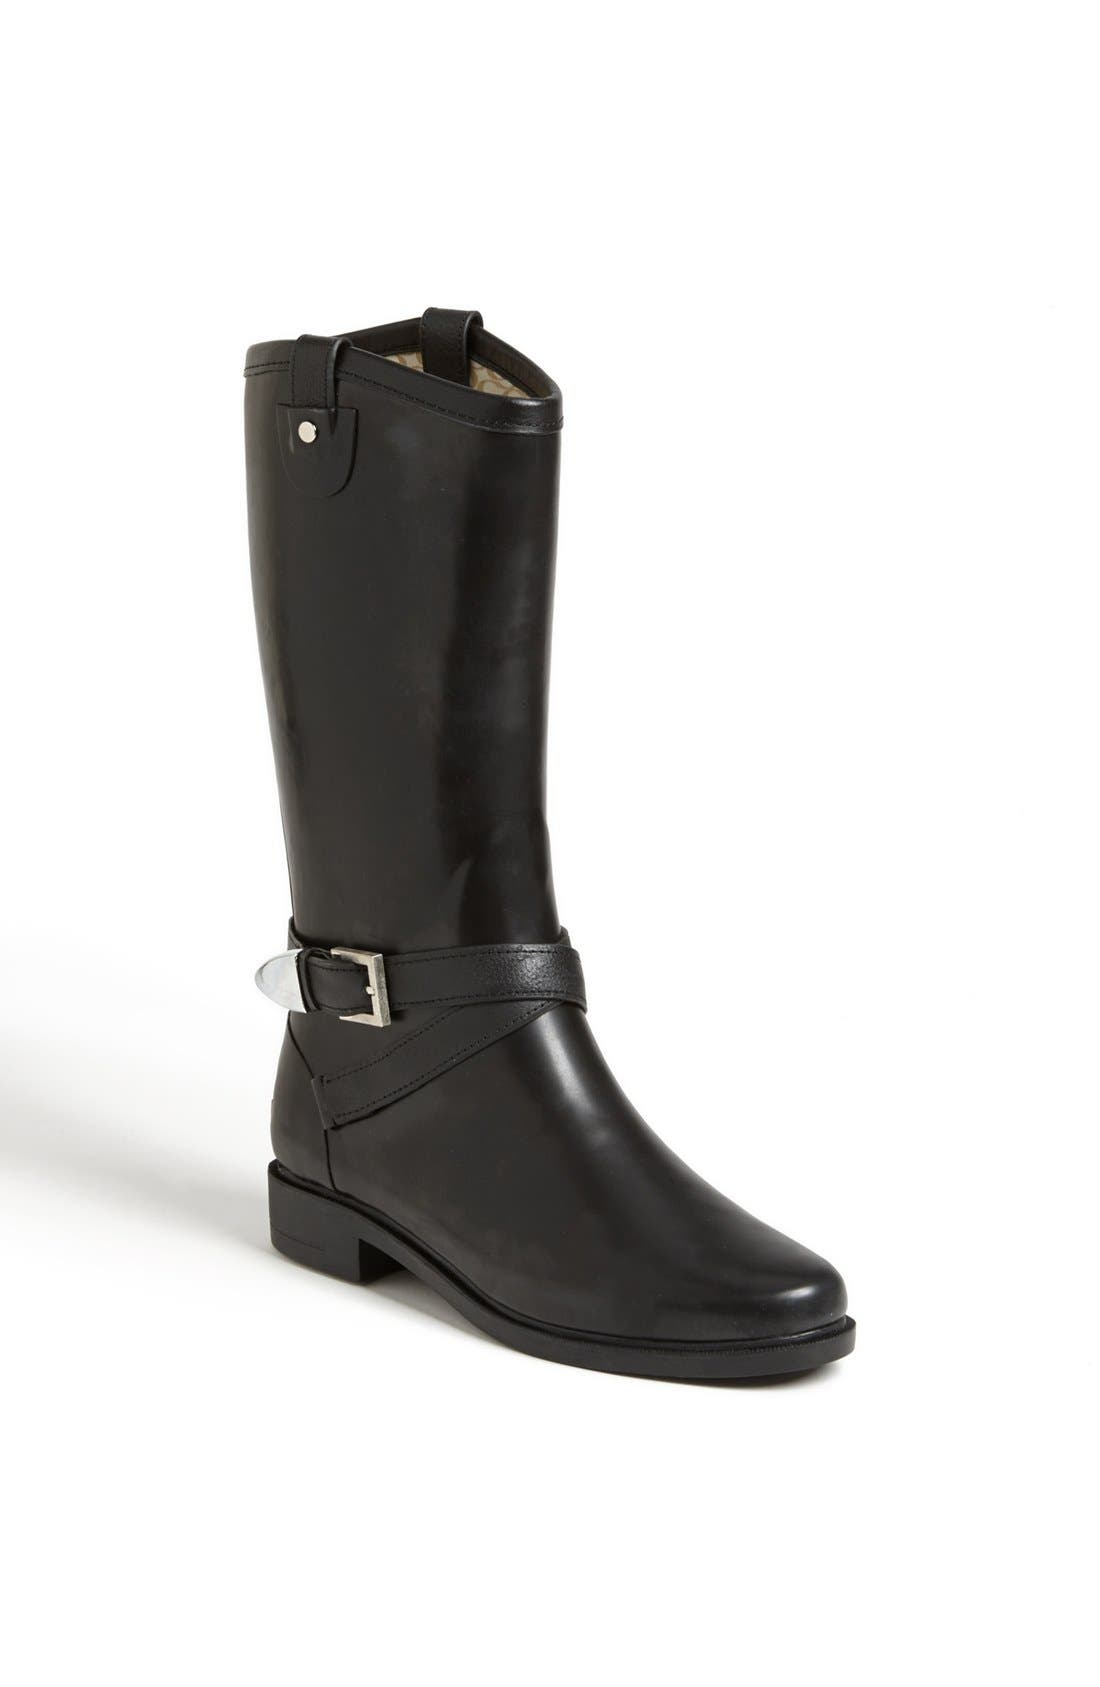 Alternate Image 1 Selected - Chooka 'Lorum Strap' Rain Boot (Women)